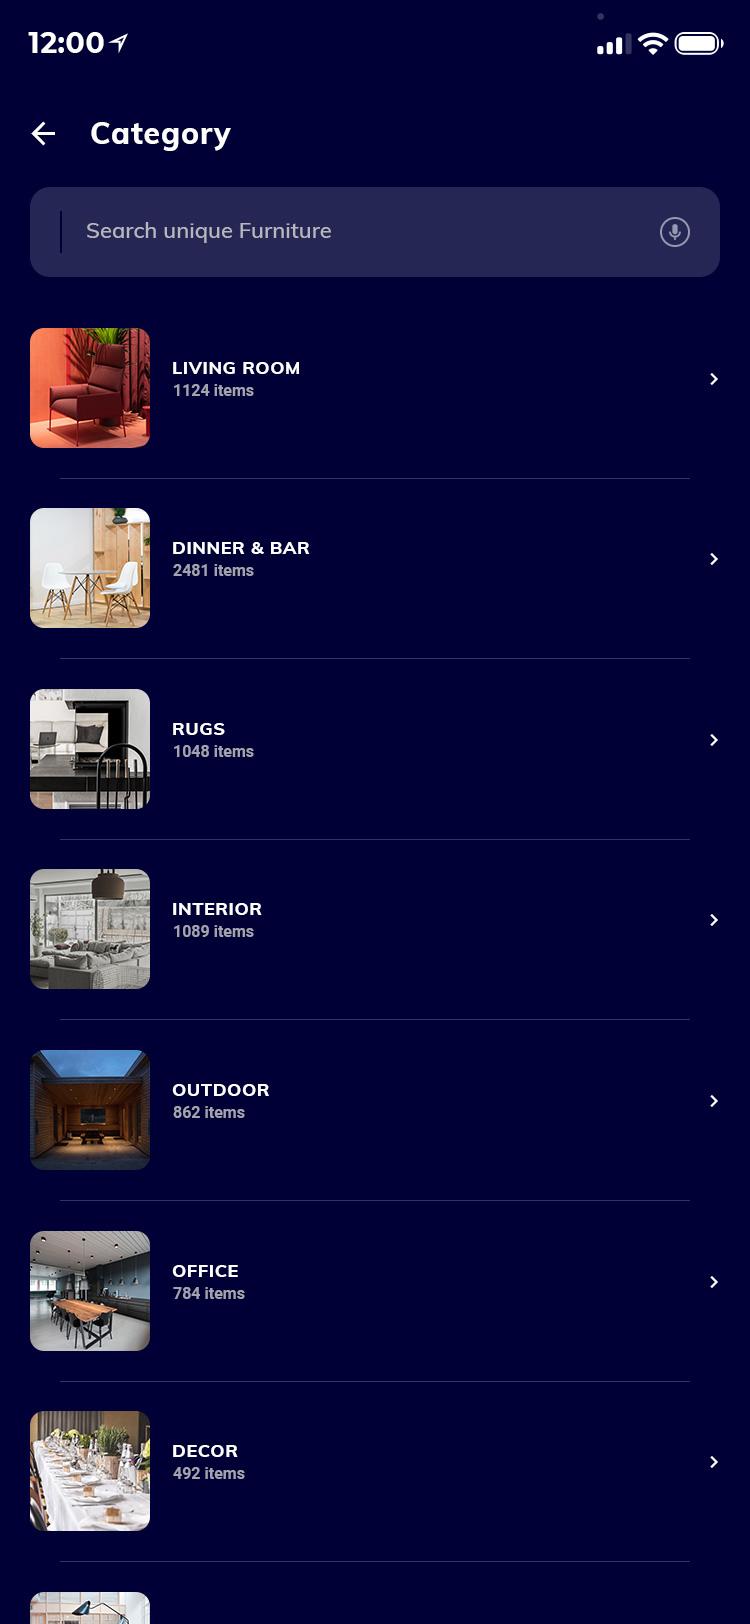 mobile-app-furniture-6